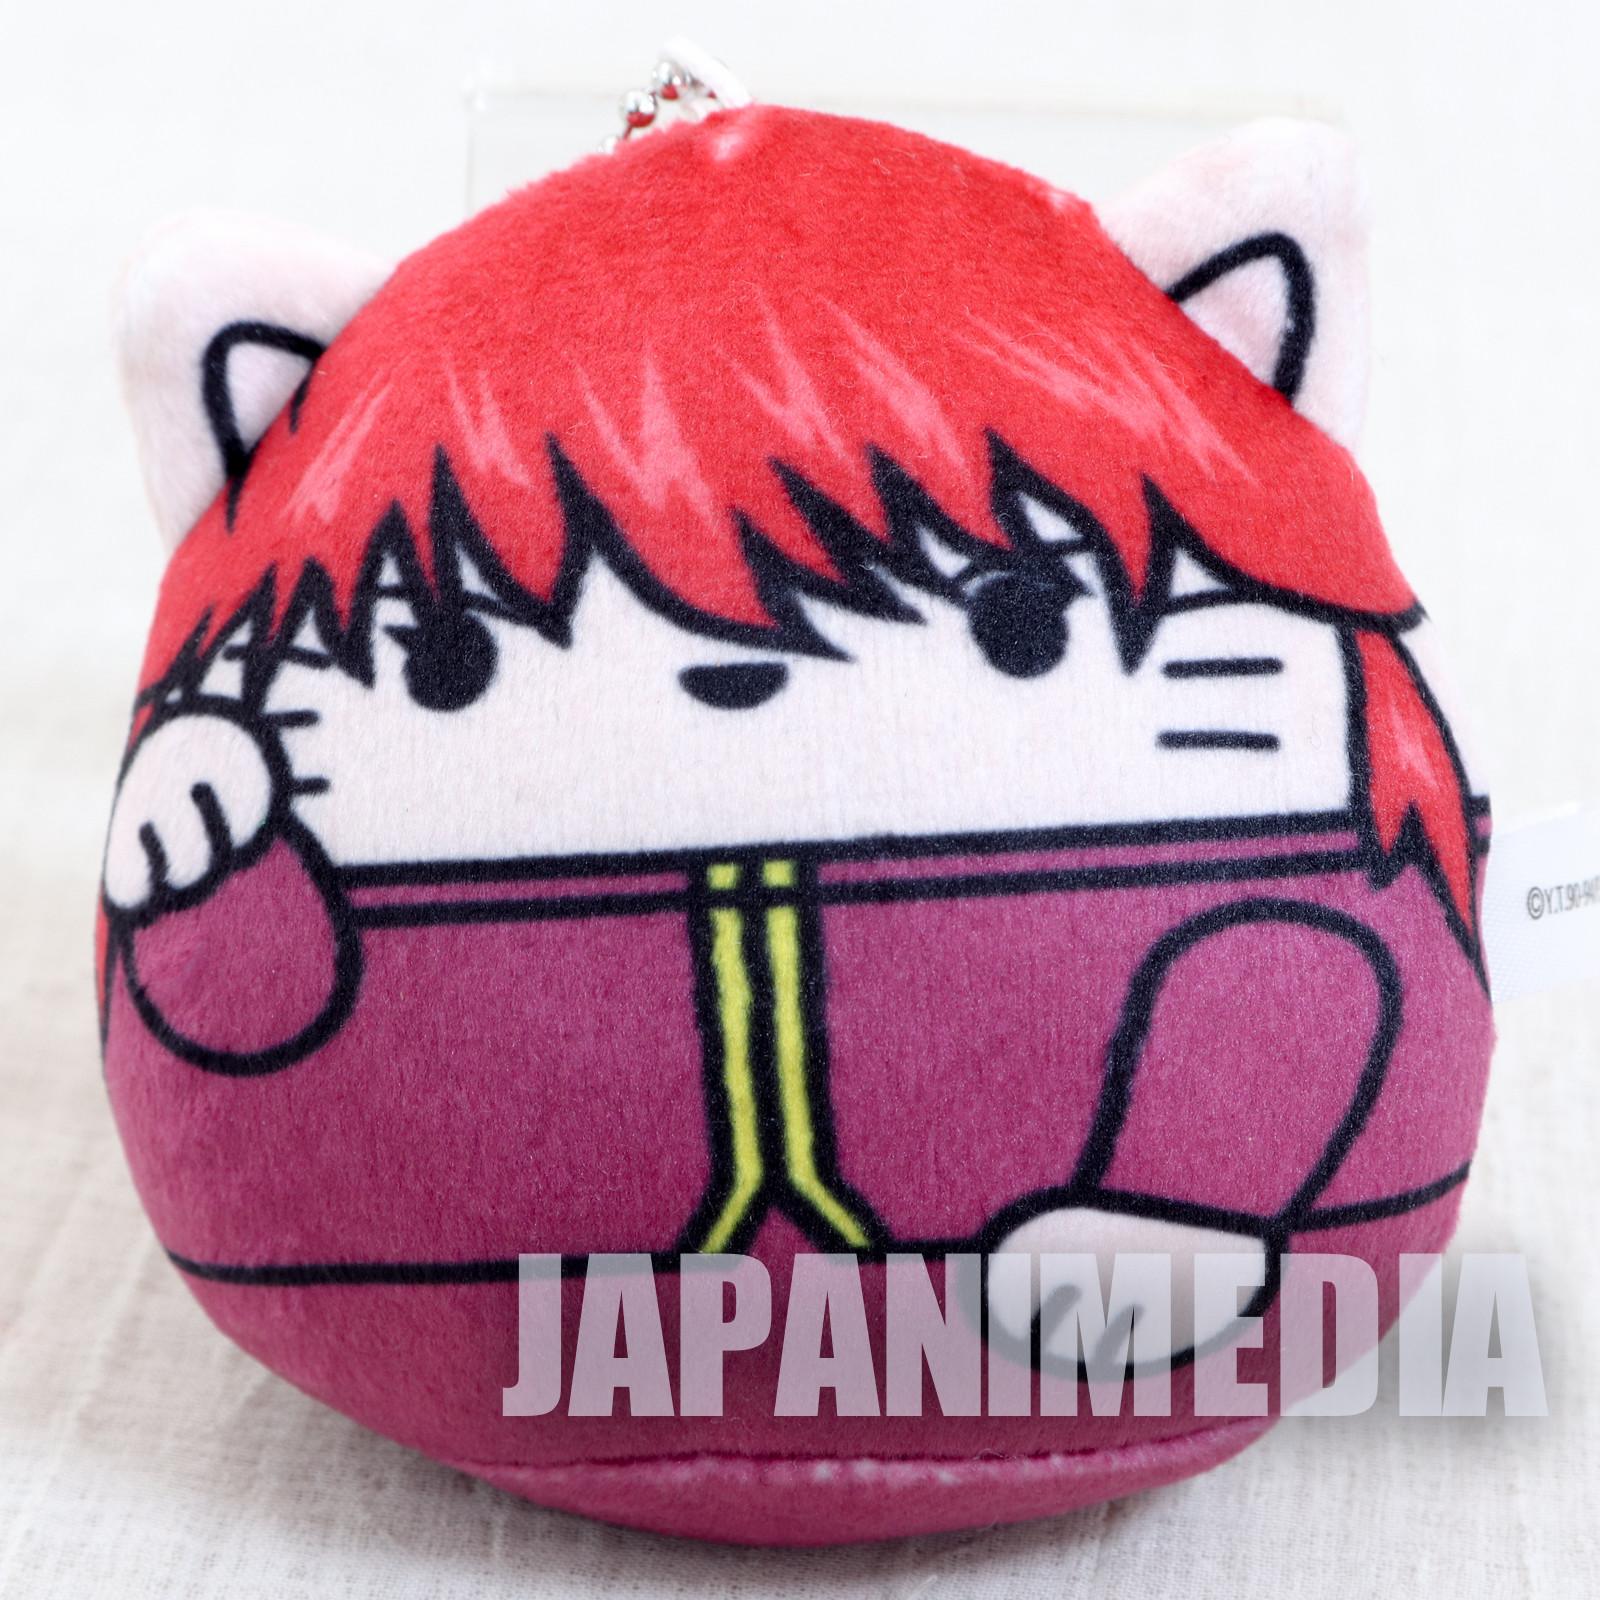 Yu-Yu Hakusho Kurama Maneki-mochi Neko Plush Doll Mascot Ballchain JAPAN